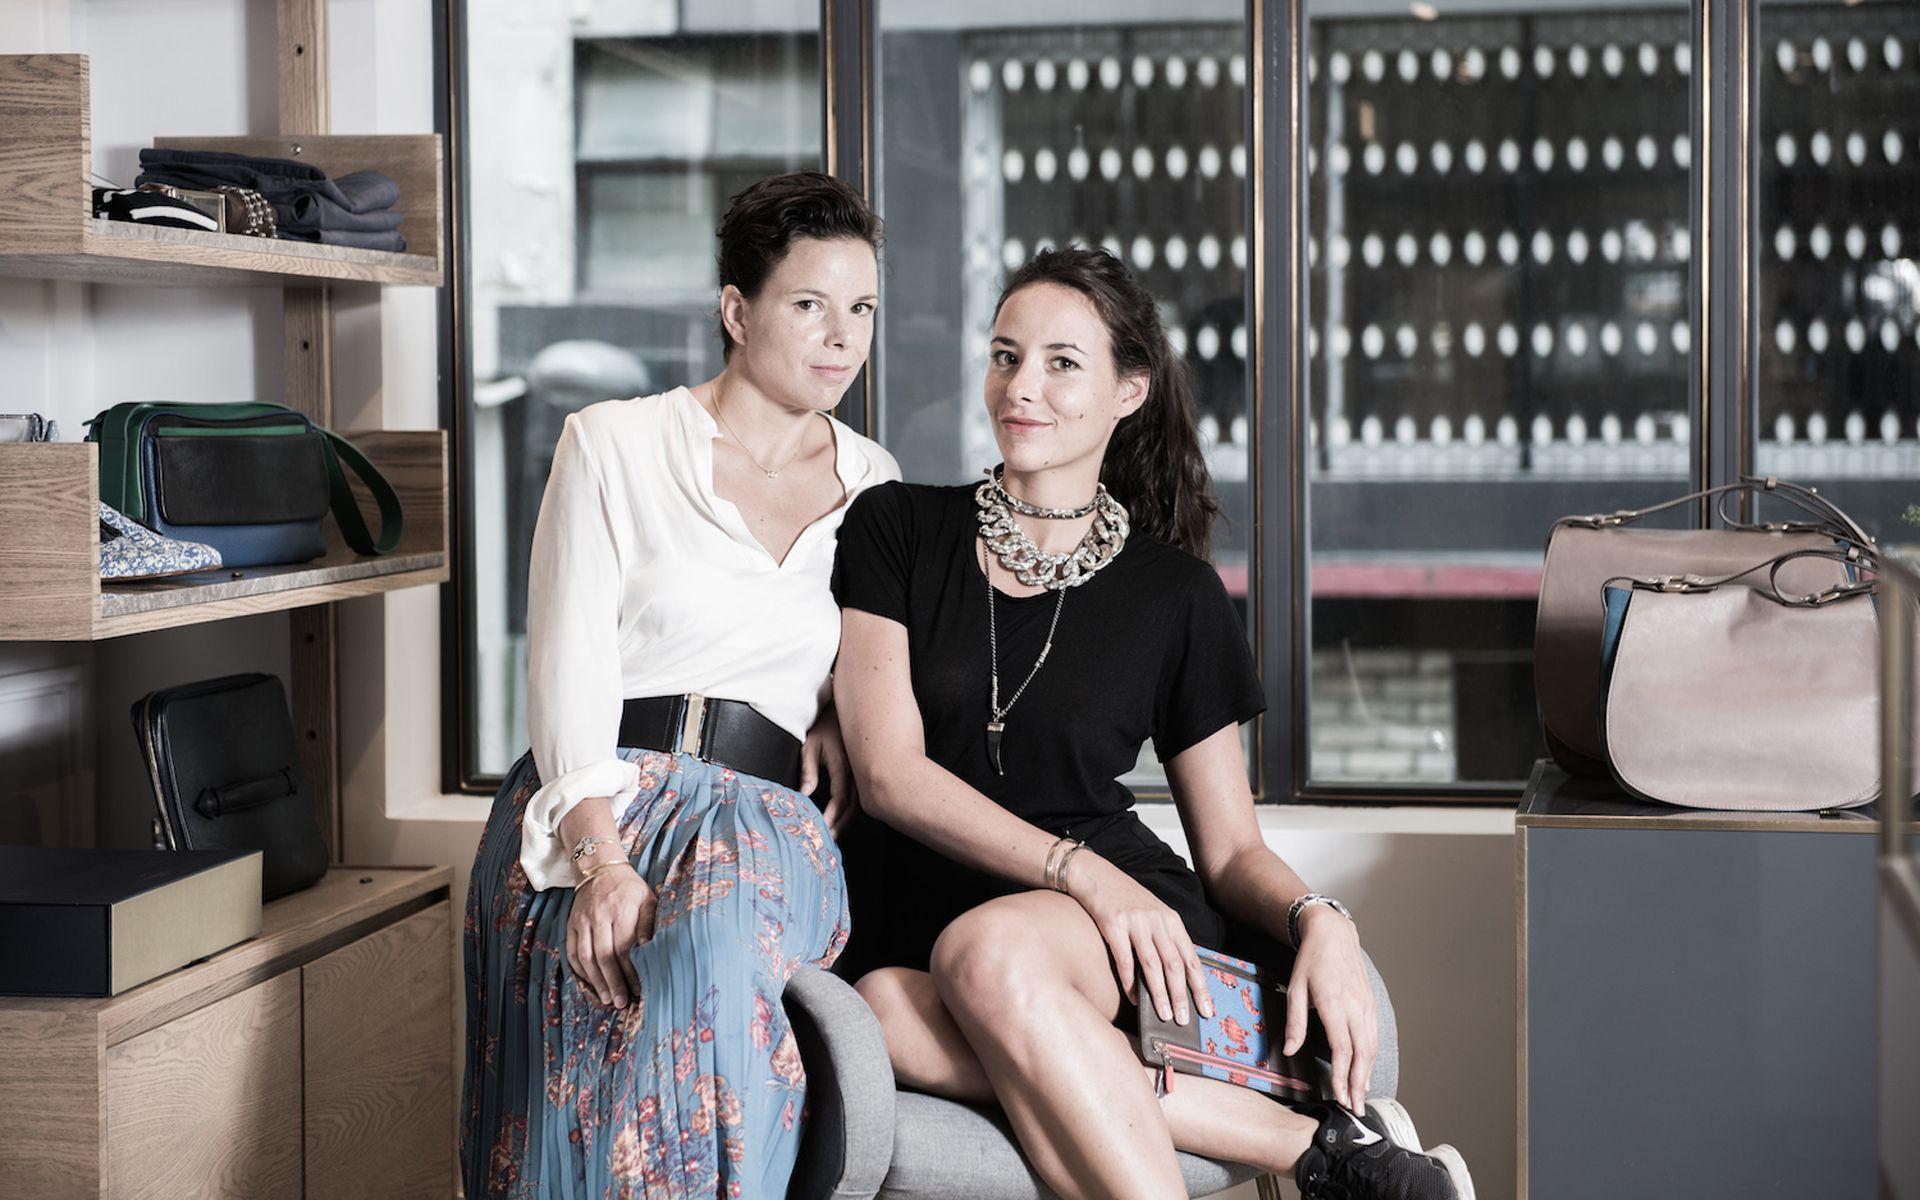 The Tatler 10: Elsa Lepeu & Johanna El Iman Of Zoobeetle Paris